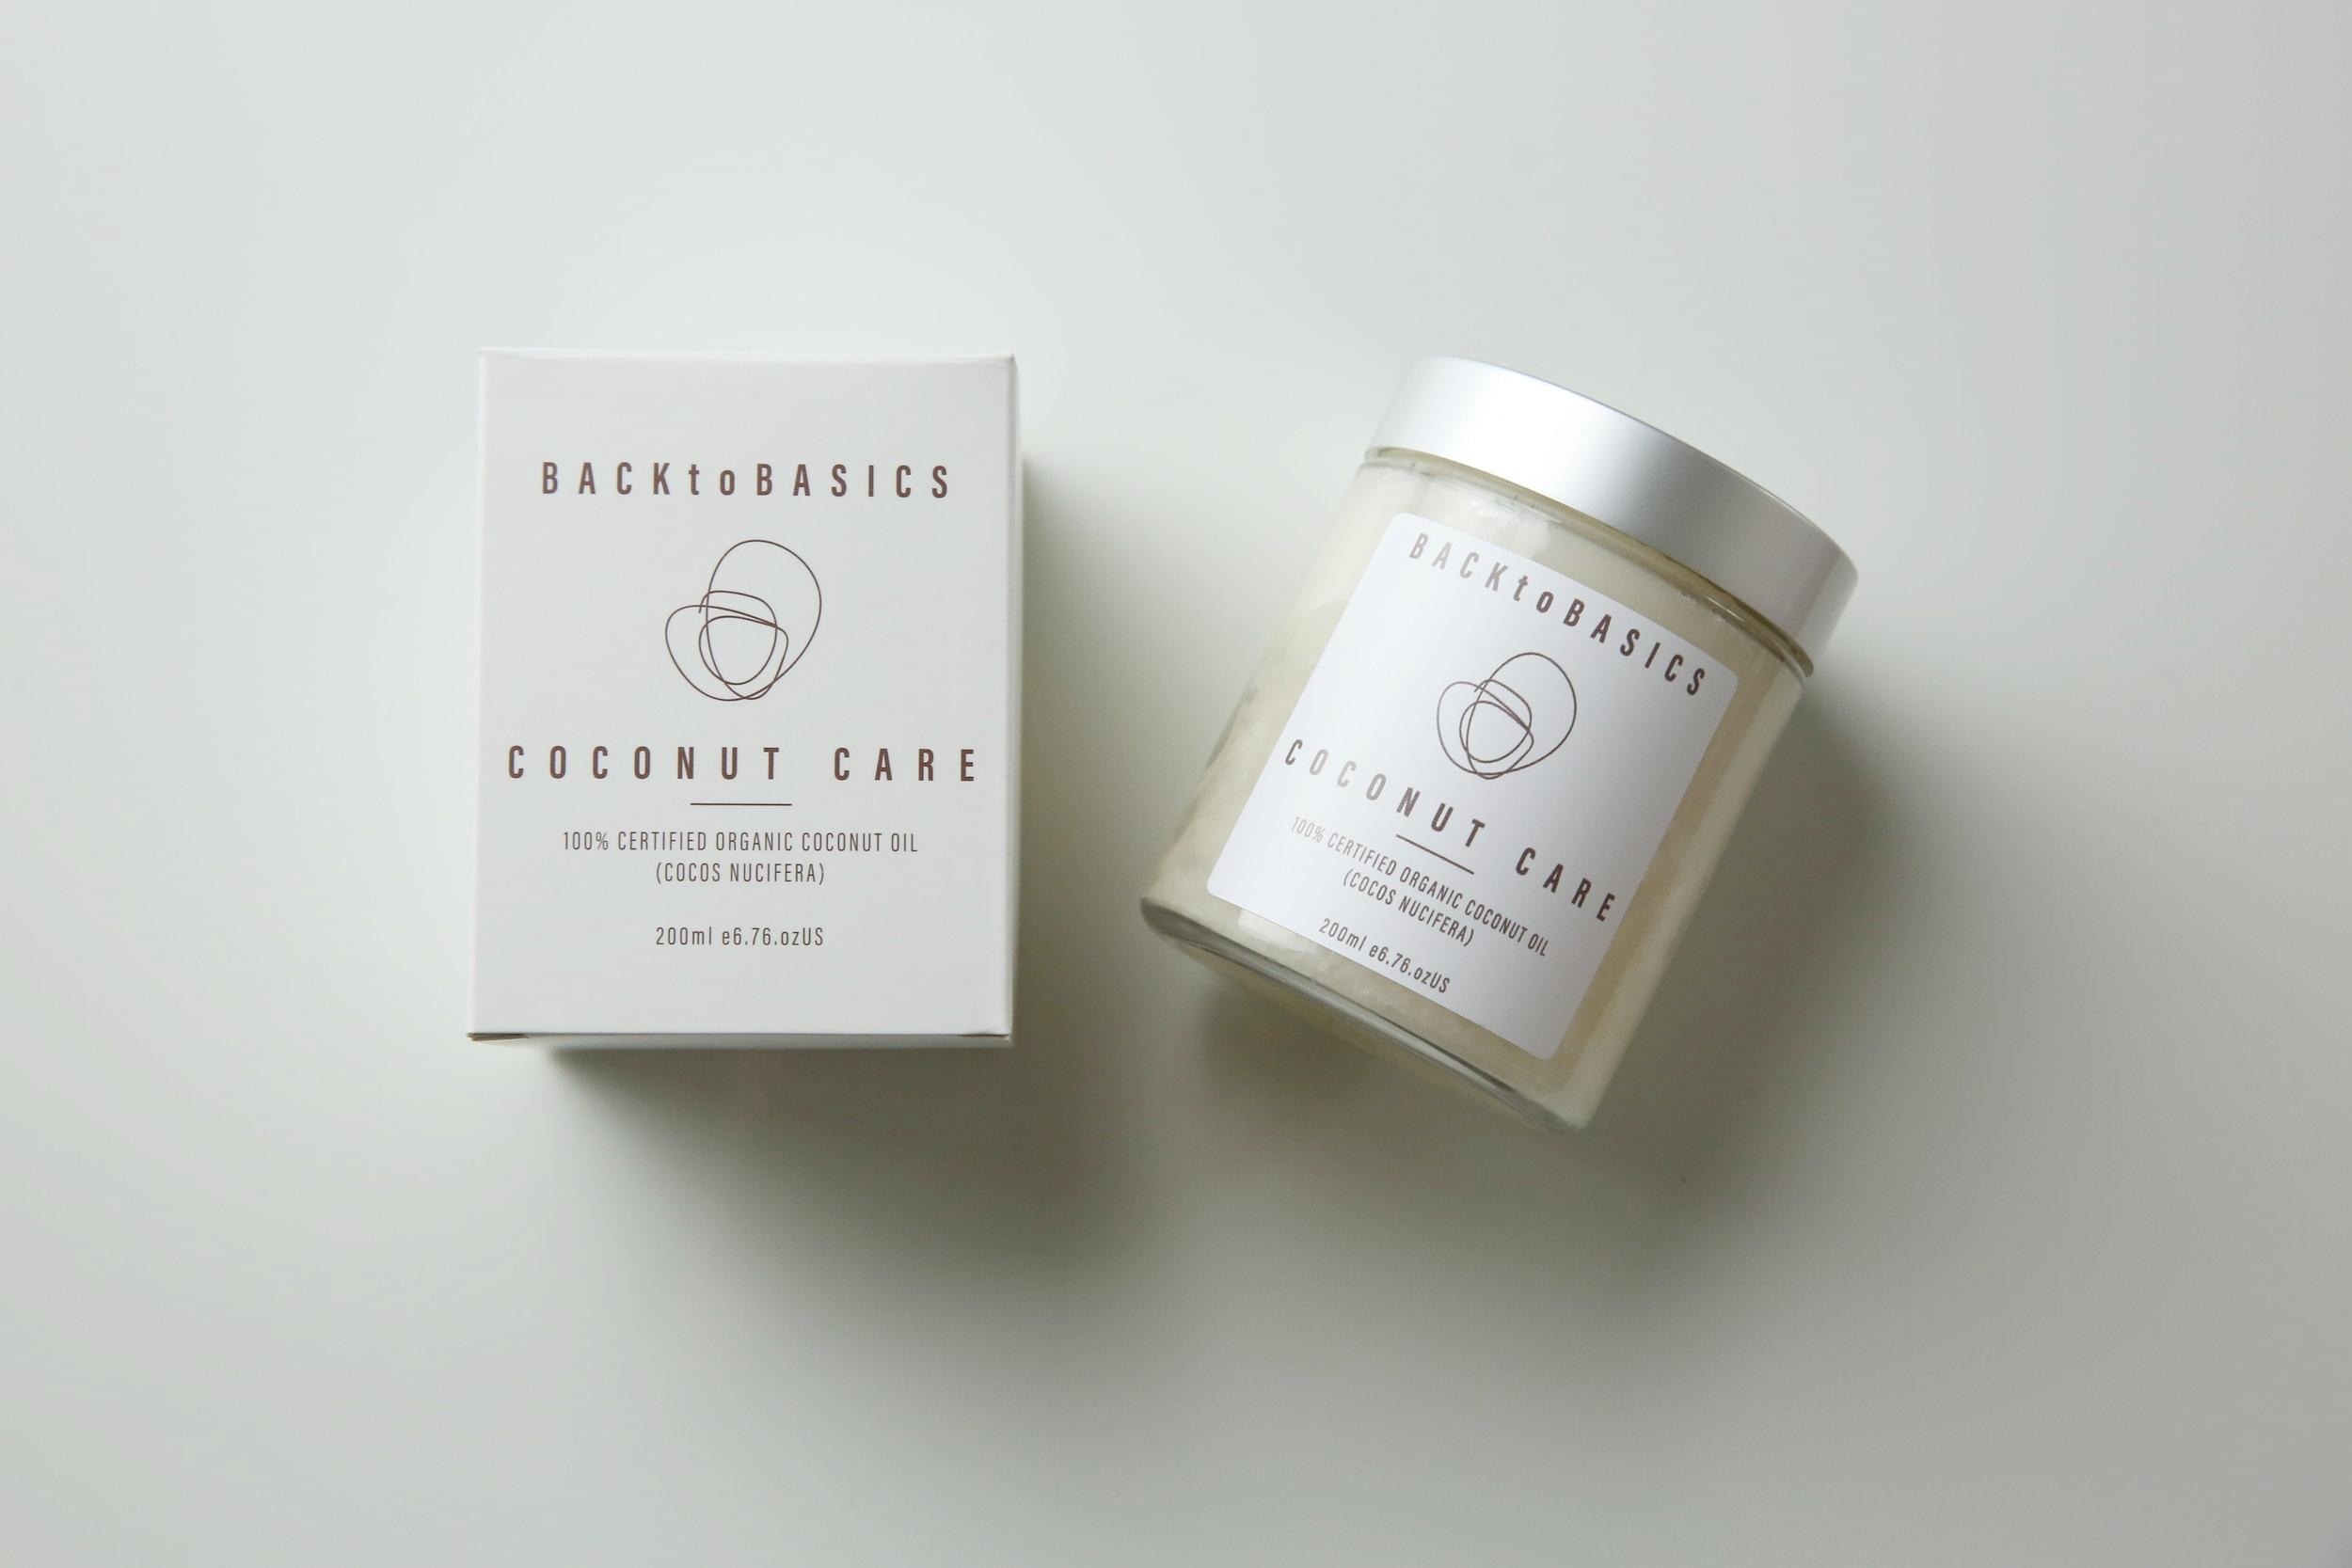 100% Certified Organic Virgin Coconut Oil - Coconut Care